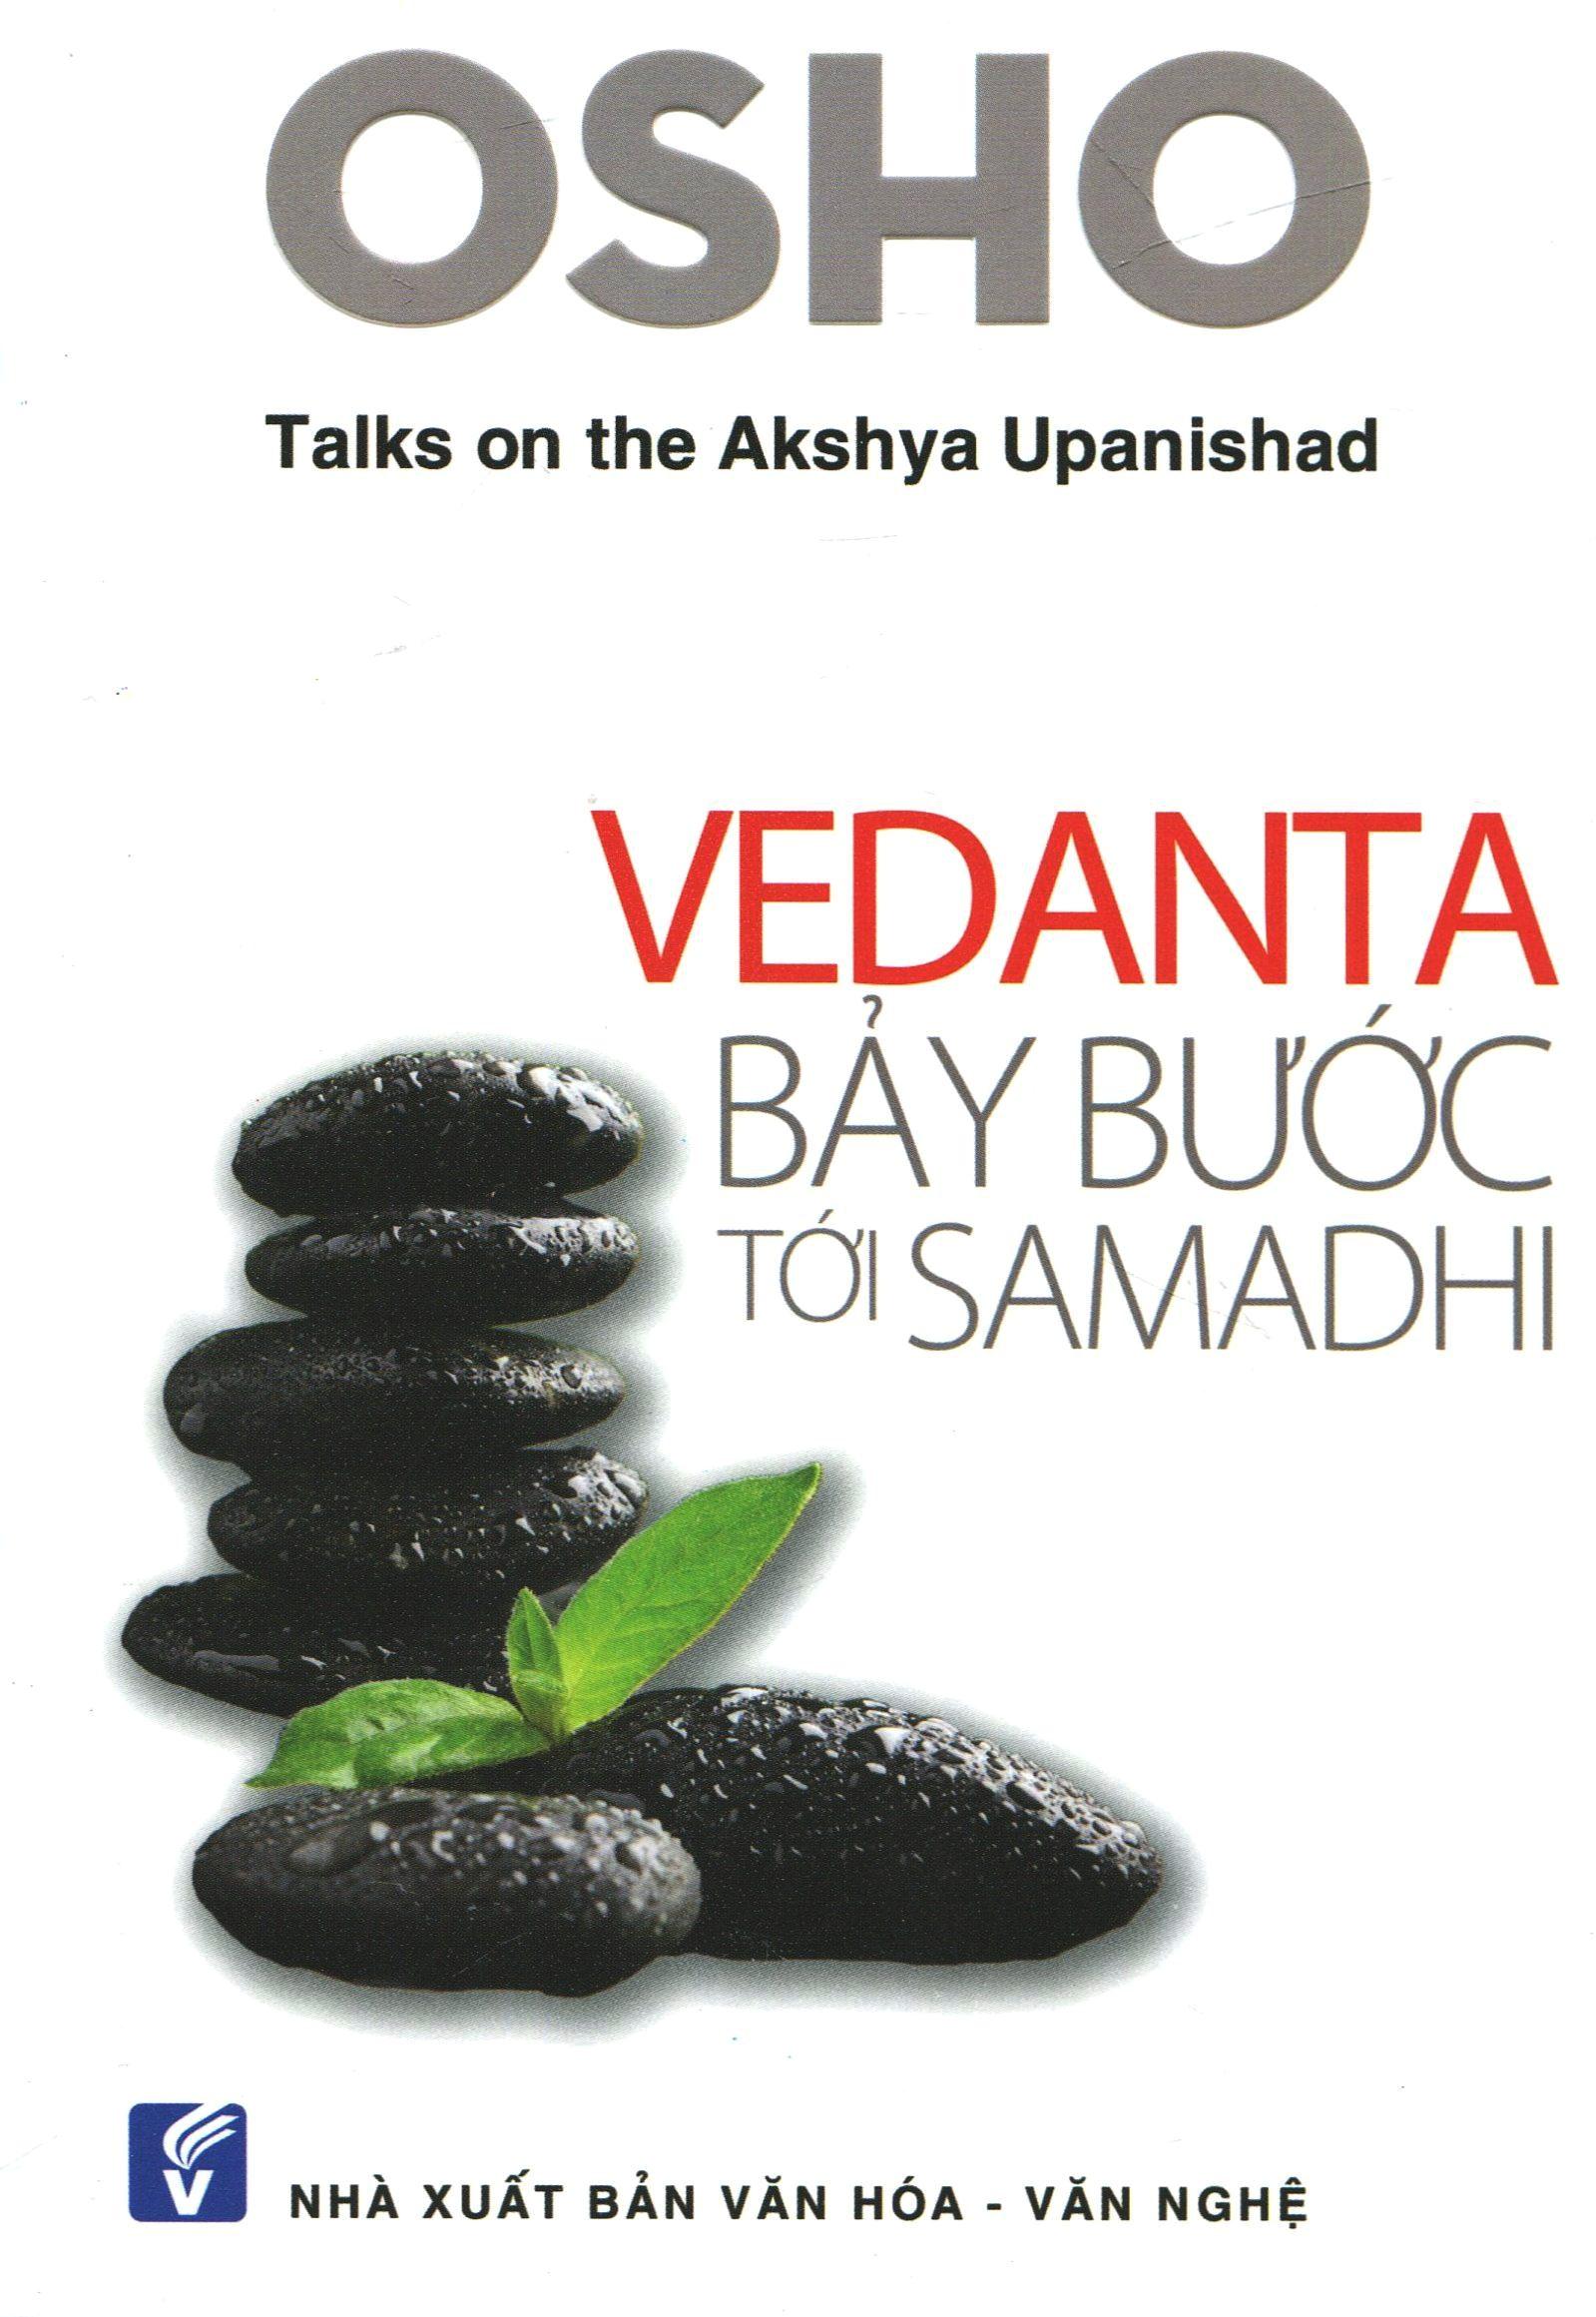 Vedanta: Bảy Bước Tới Samadhi